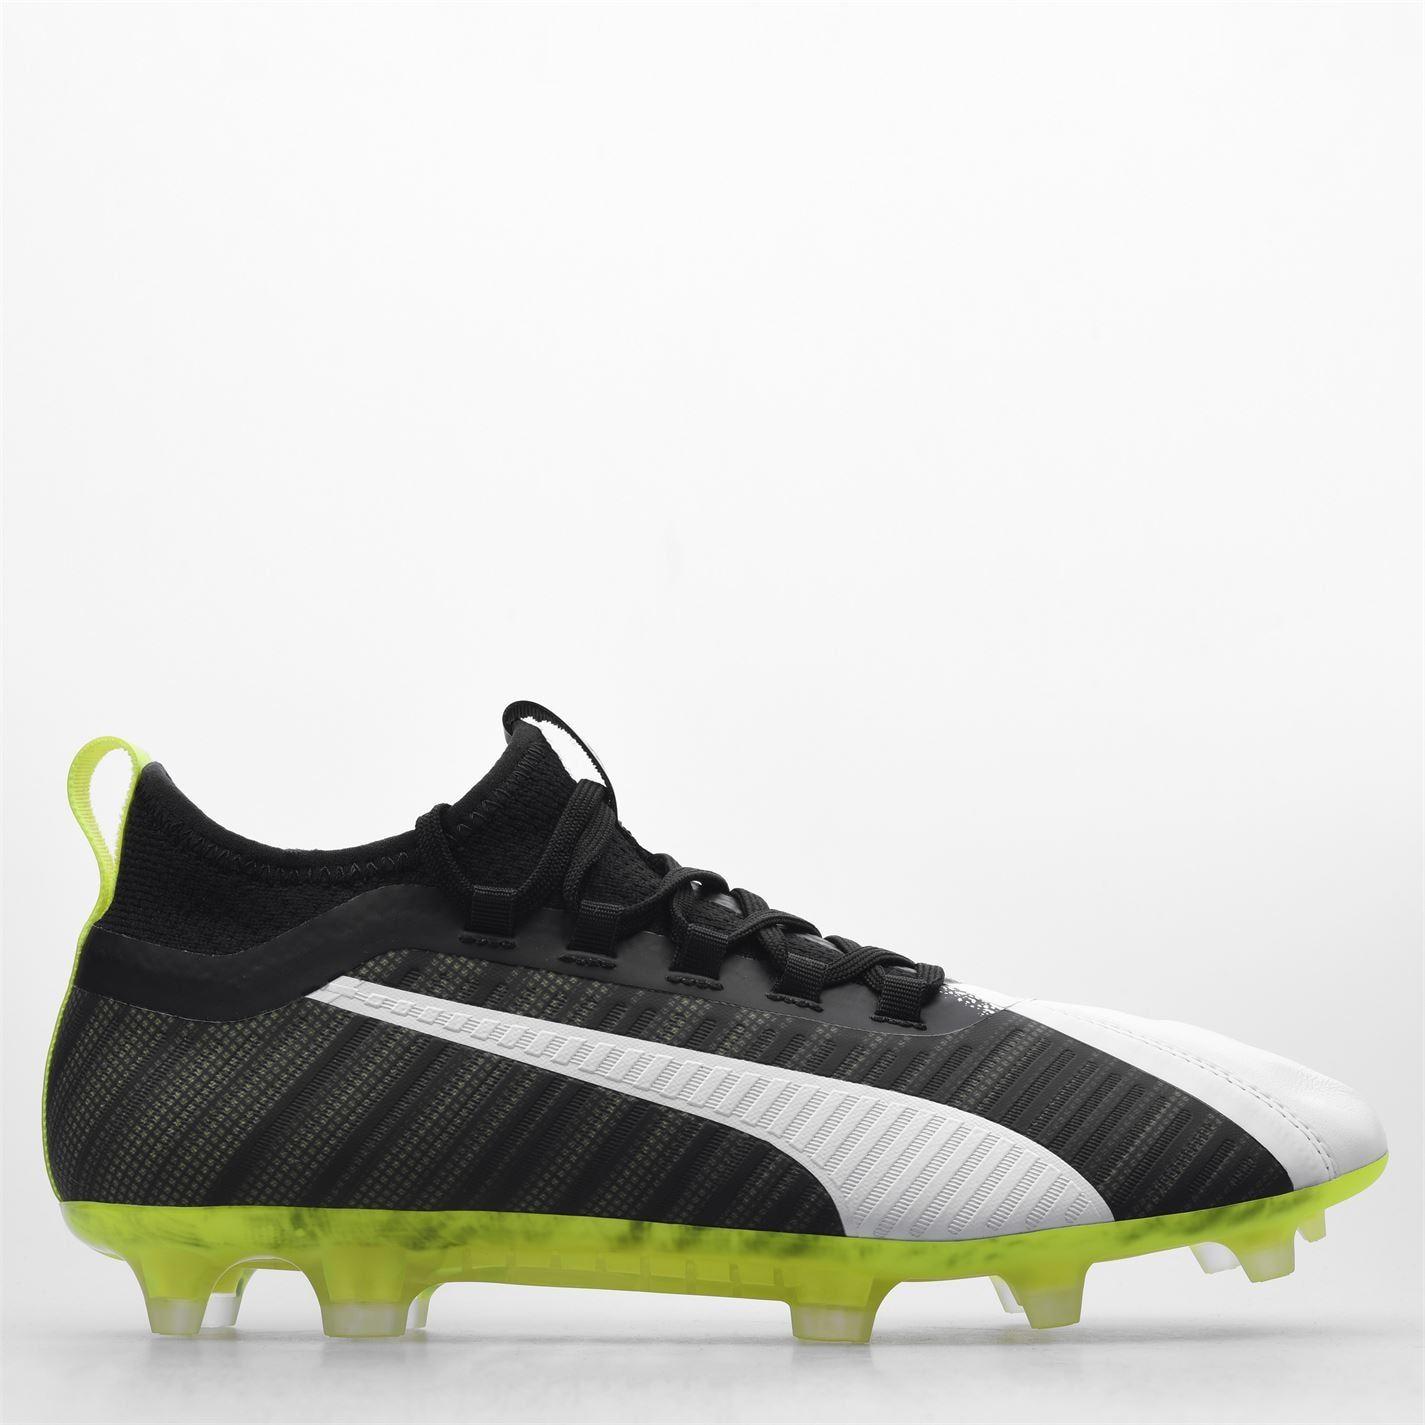 miniature 10 - Puma-5-2-FG-Firm-Ground-Football-Bottes-Homme-Chaussures-De-Foot-Crampons-Baskets